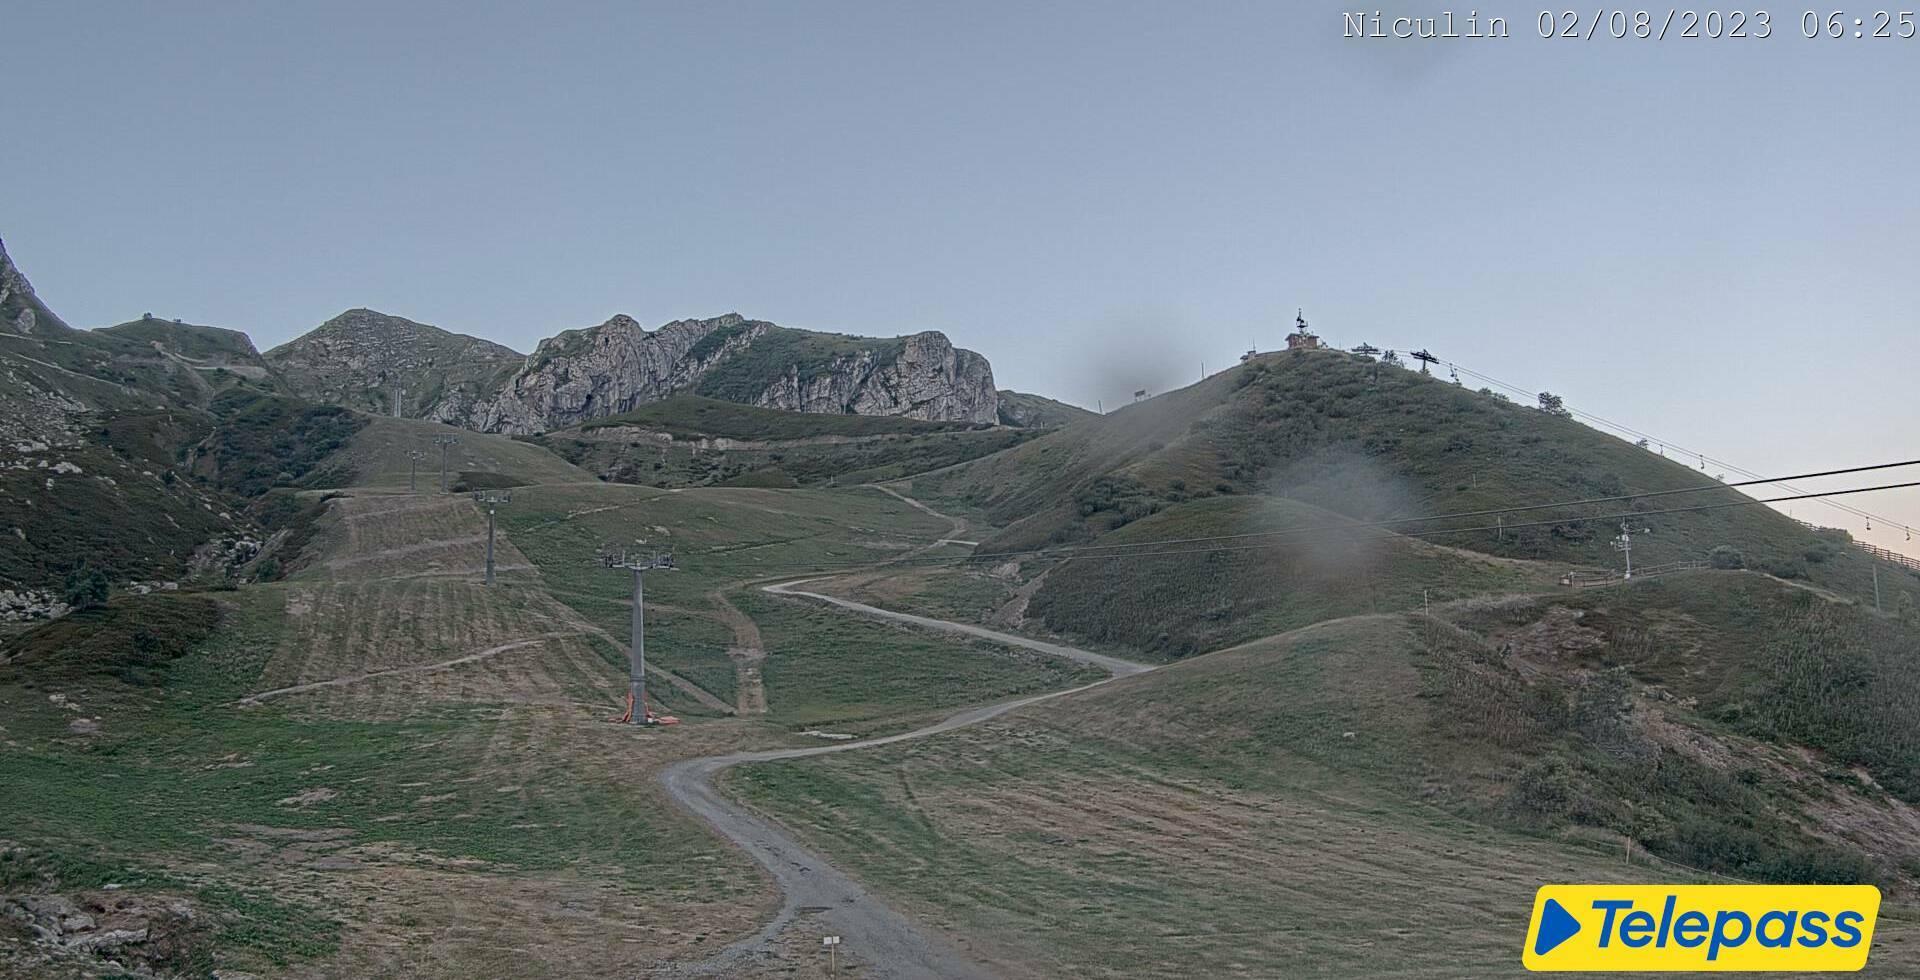 Limone Piemonte webcam - Niculin slope